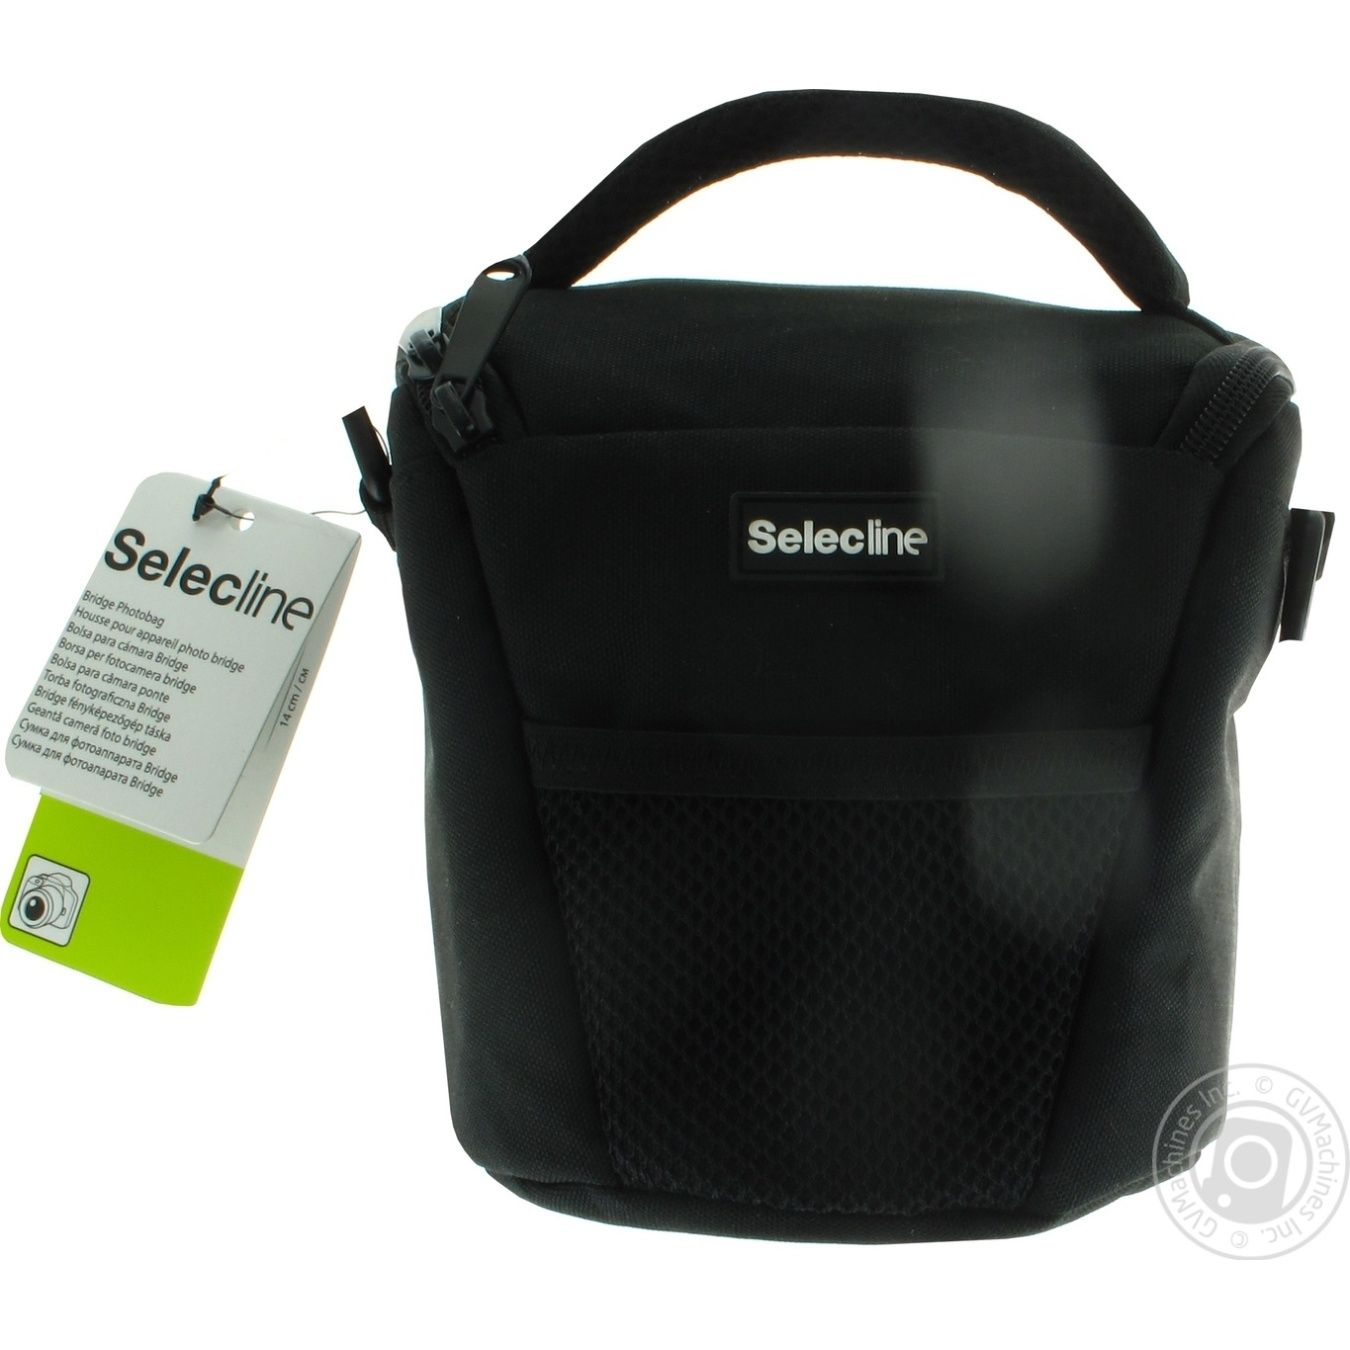 6da791d0fc2d корзины, коробки, пакеты — Auchan Интернет Магазин